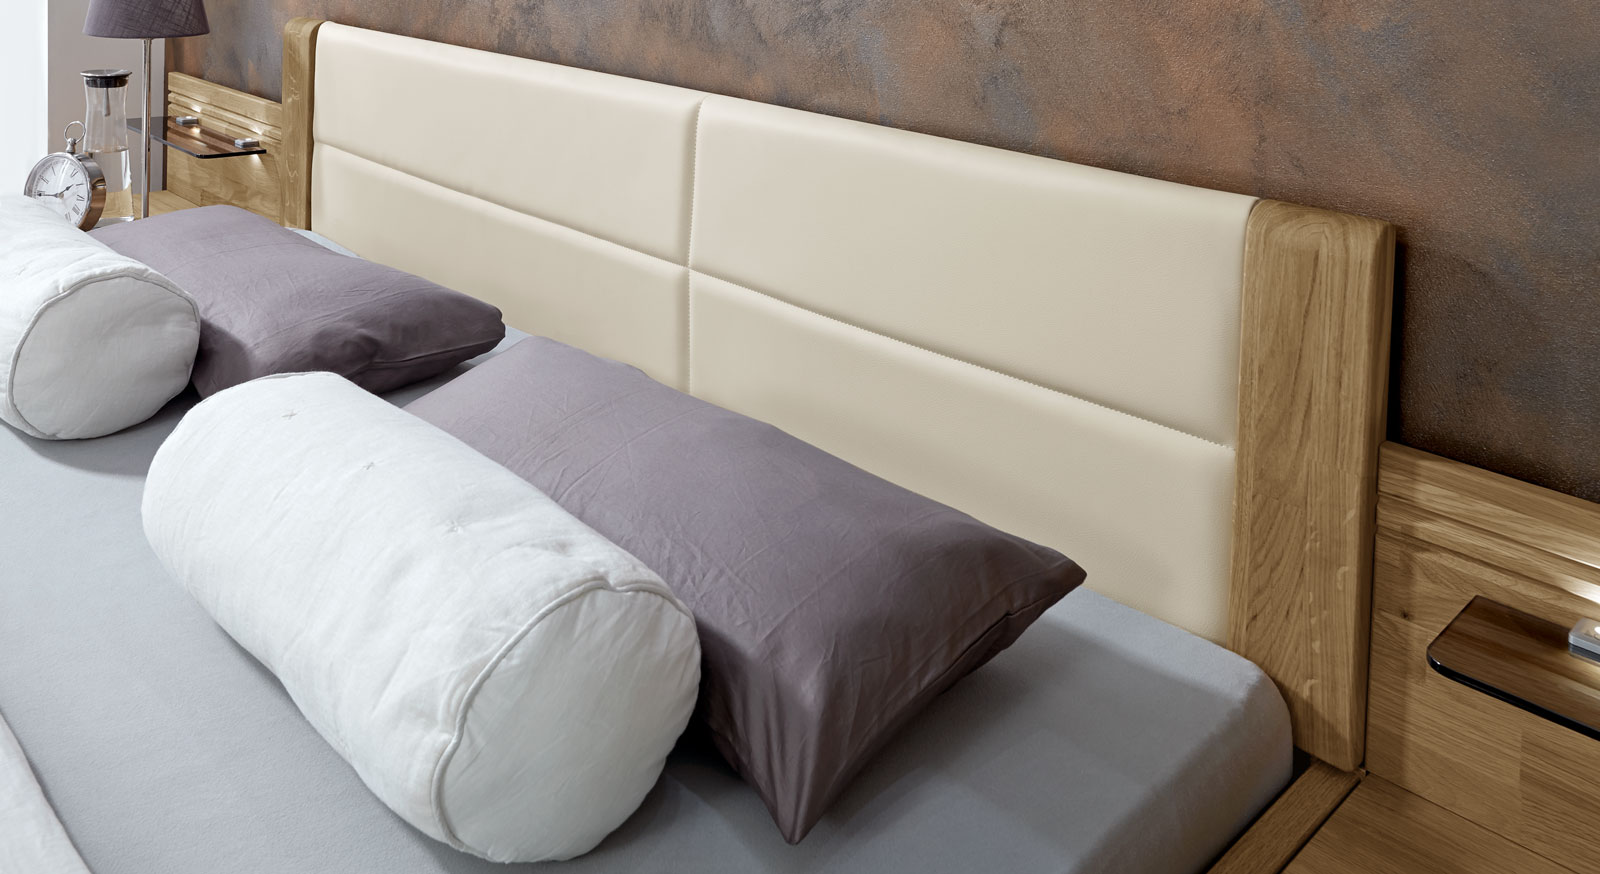 Schubkasten-Doppelbett Toride mit optionalem Kunstlederkopfteil